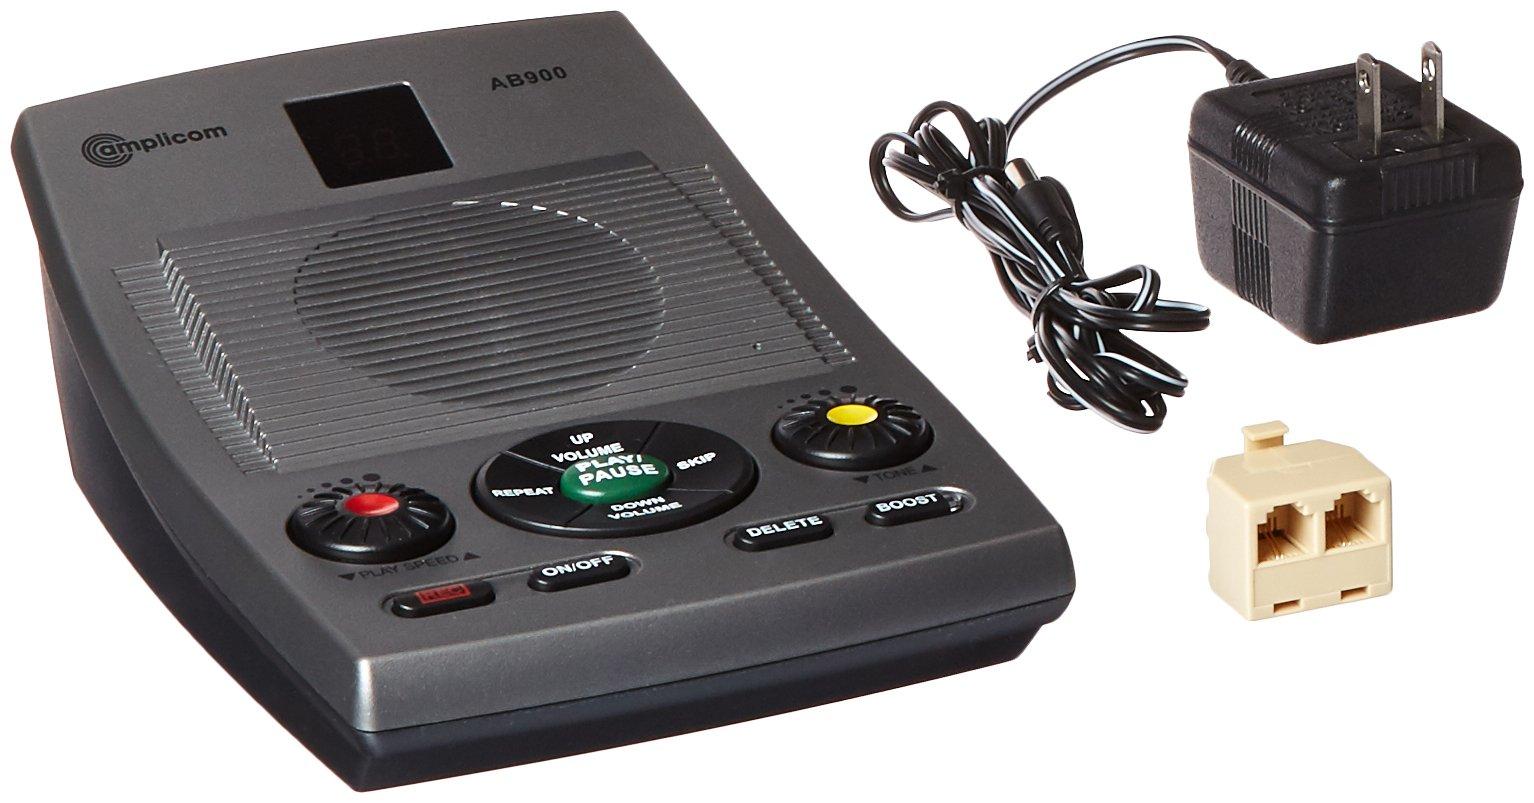 Amplicom AB900 Amplified Answering Machine Landline Telephone Accessory by Amplicom